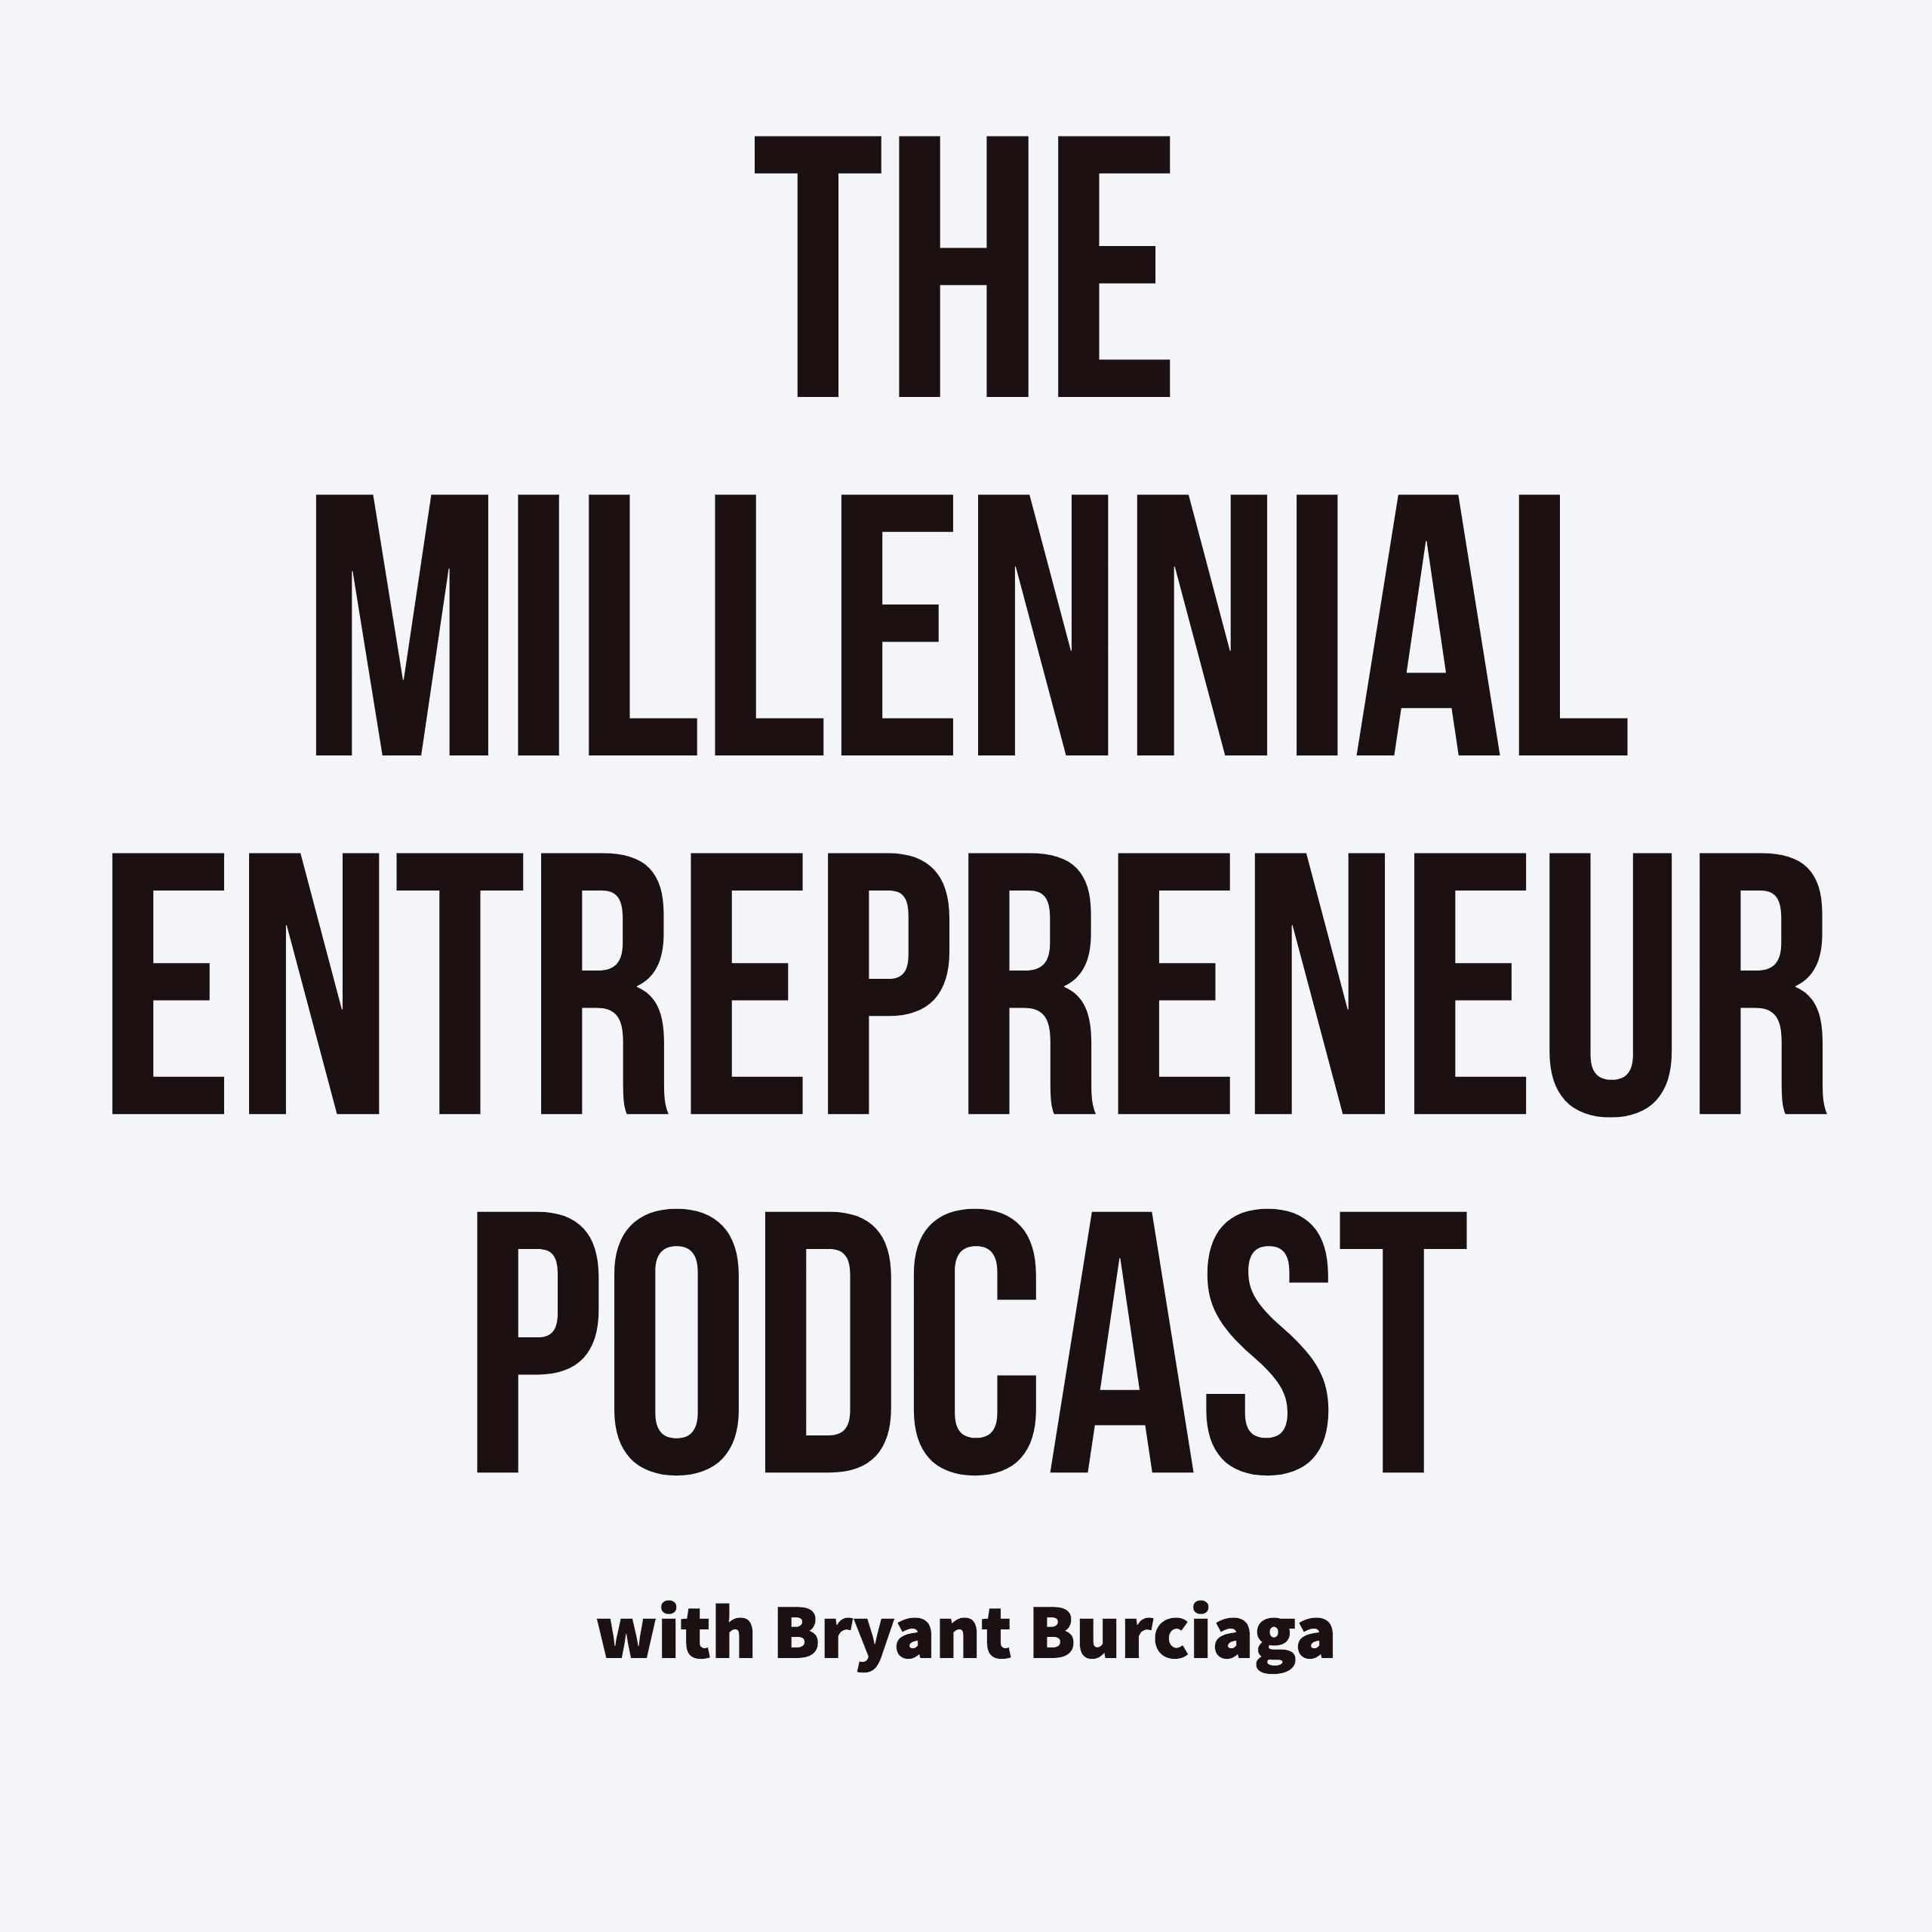 The Millennial Entrepreneur Podcast